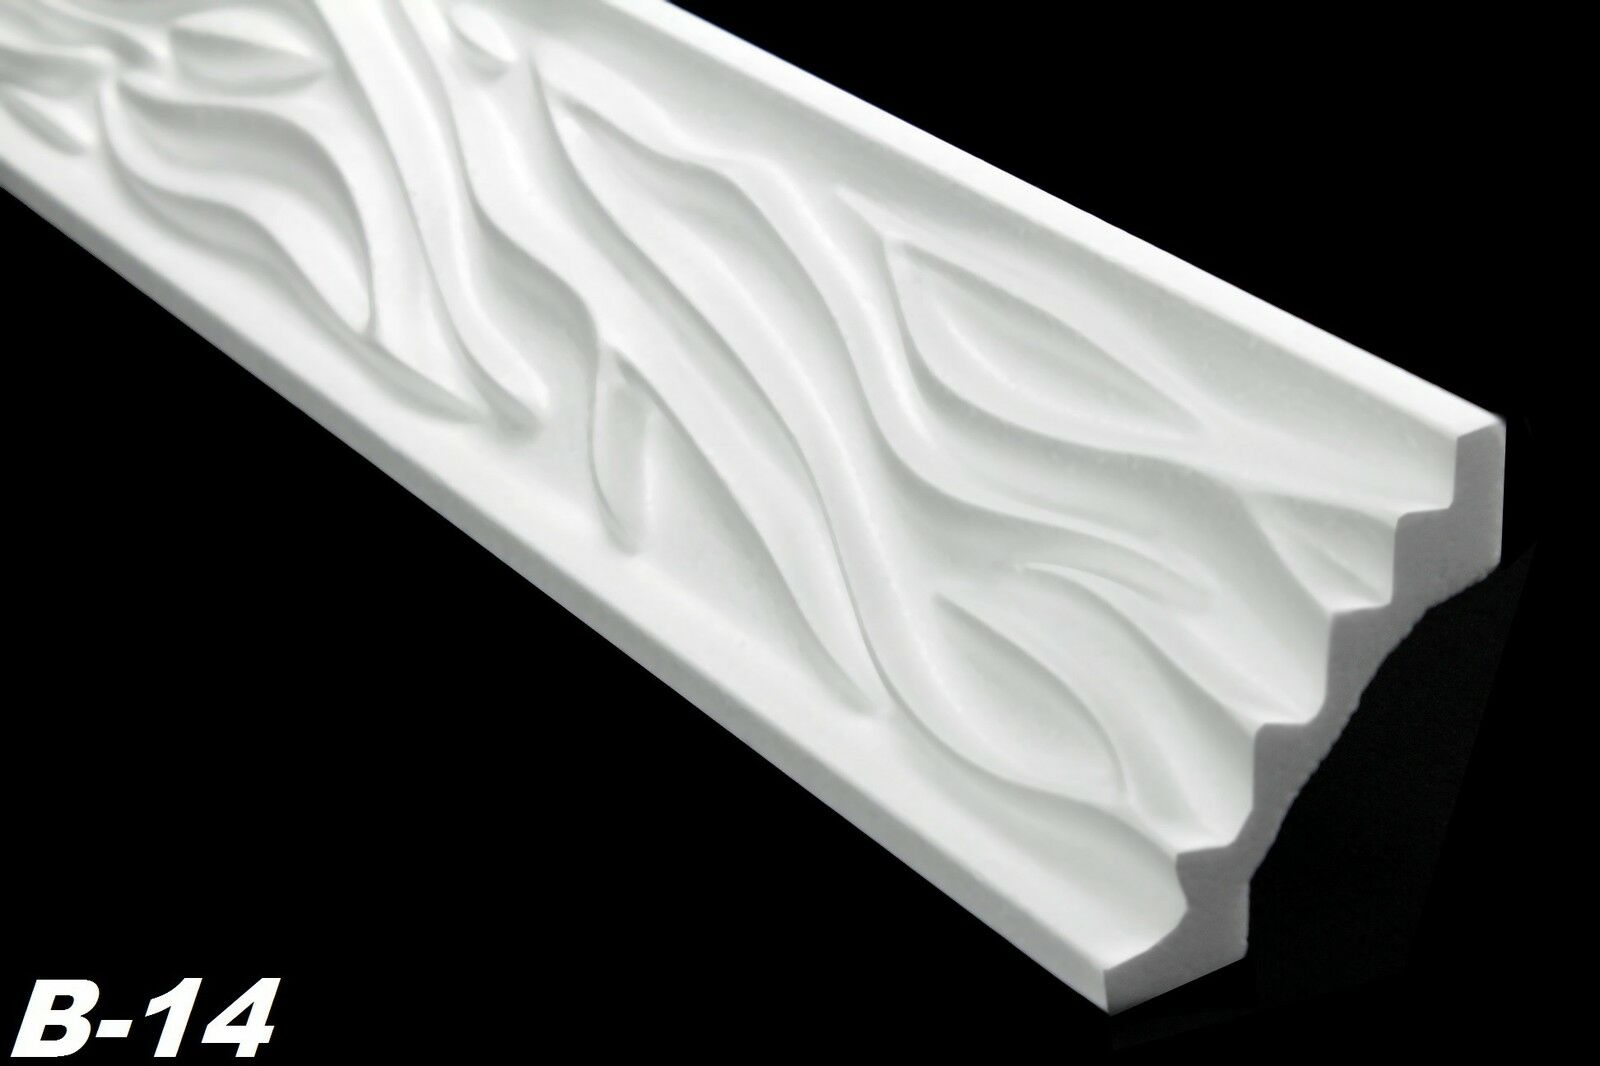 10 meter eckleisten zierprofile stuck dekoration styropor. Black Bedroom Furniture Sets. Home Design Ideas